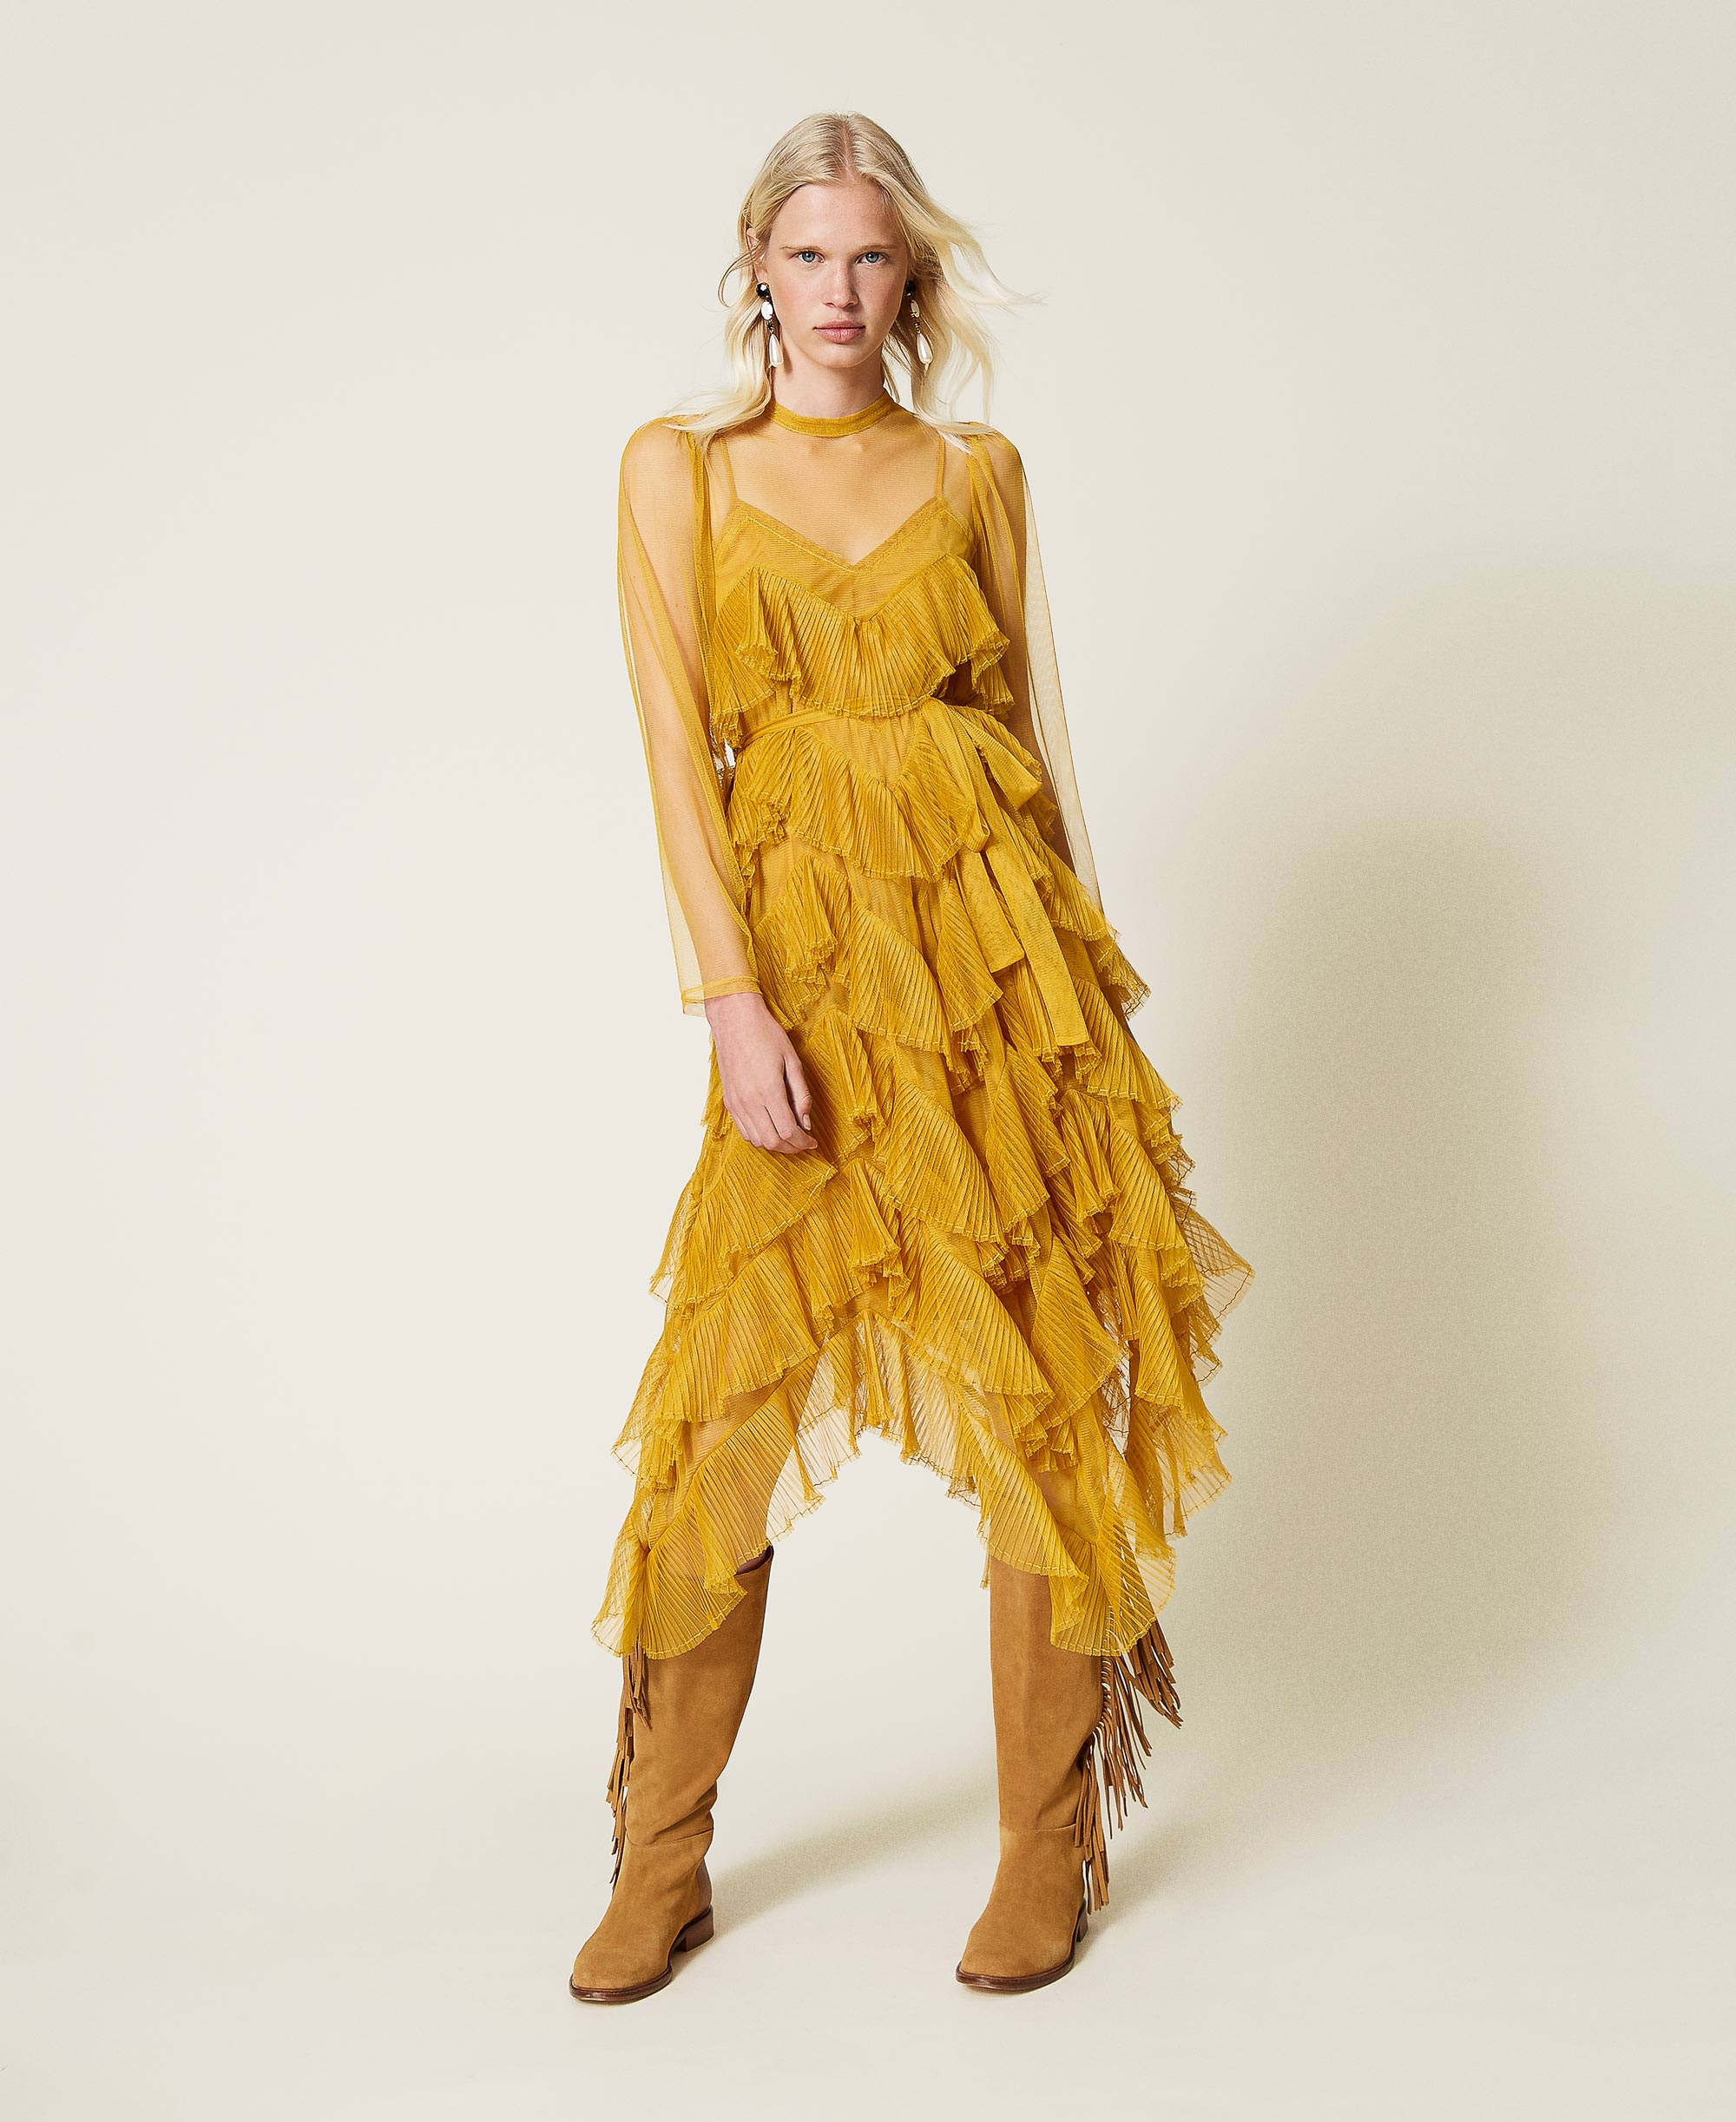 Kleid Gelb Volant  Atlanta 2021